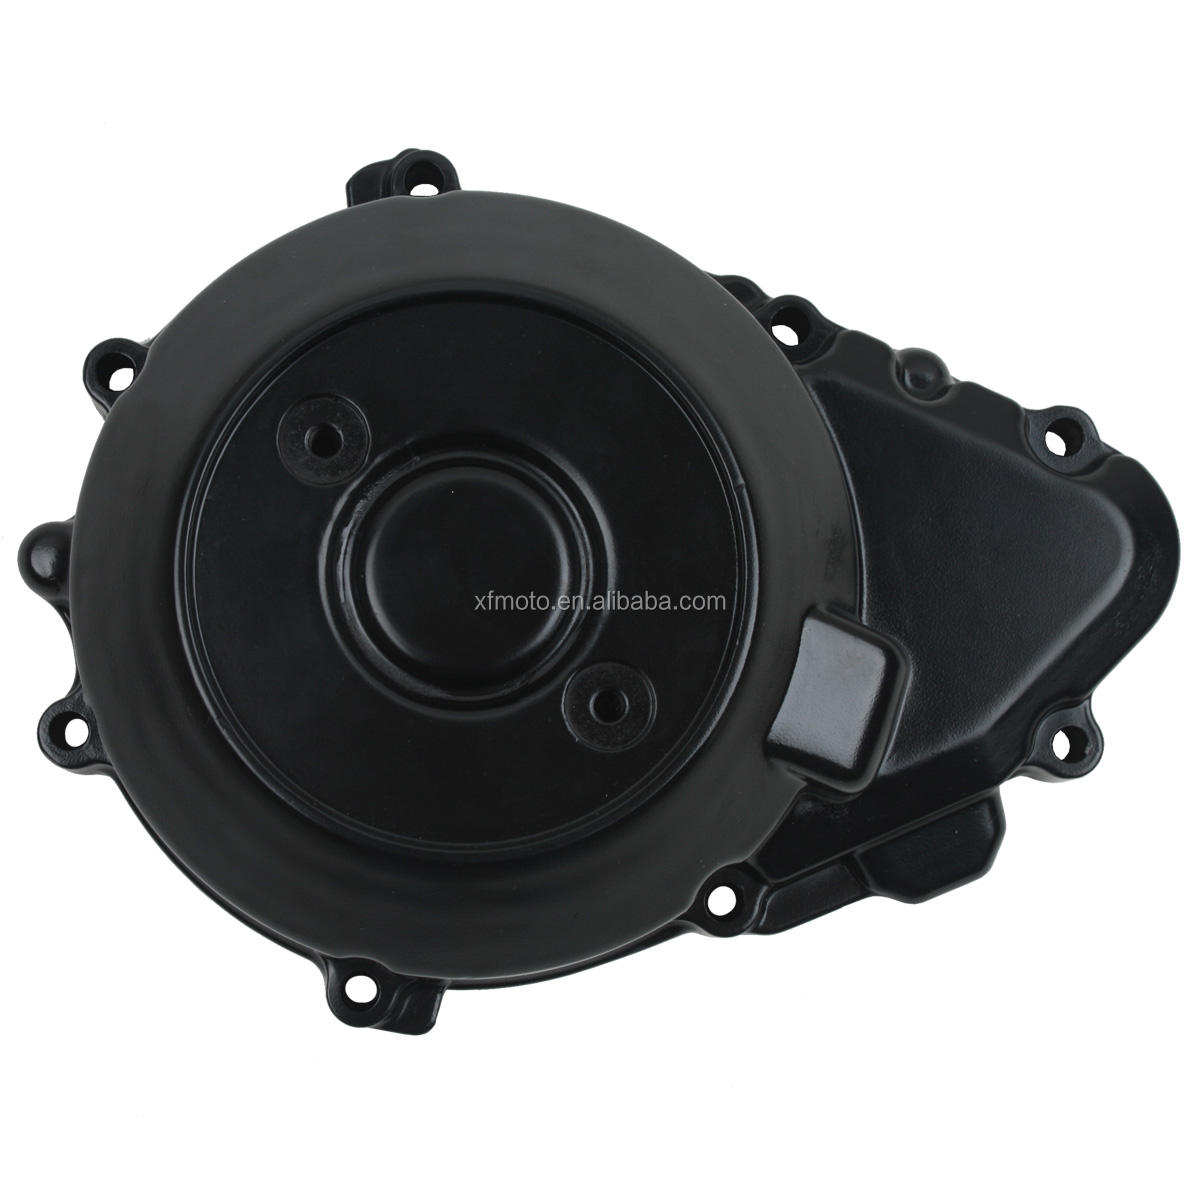 STANDARD 8 10 PENNANT DISTRIBUTOR CAP GDC114